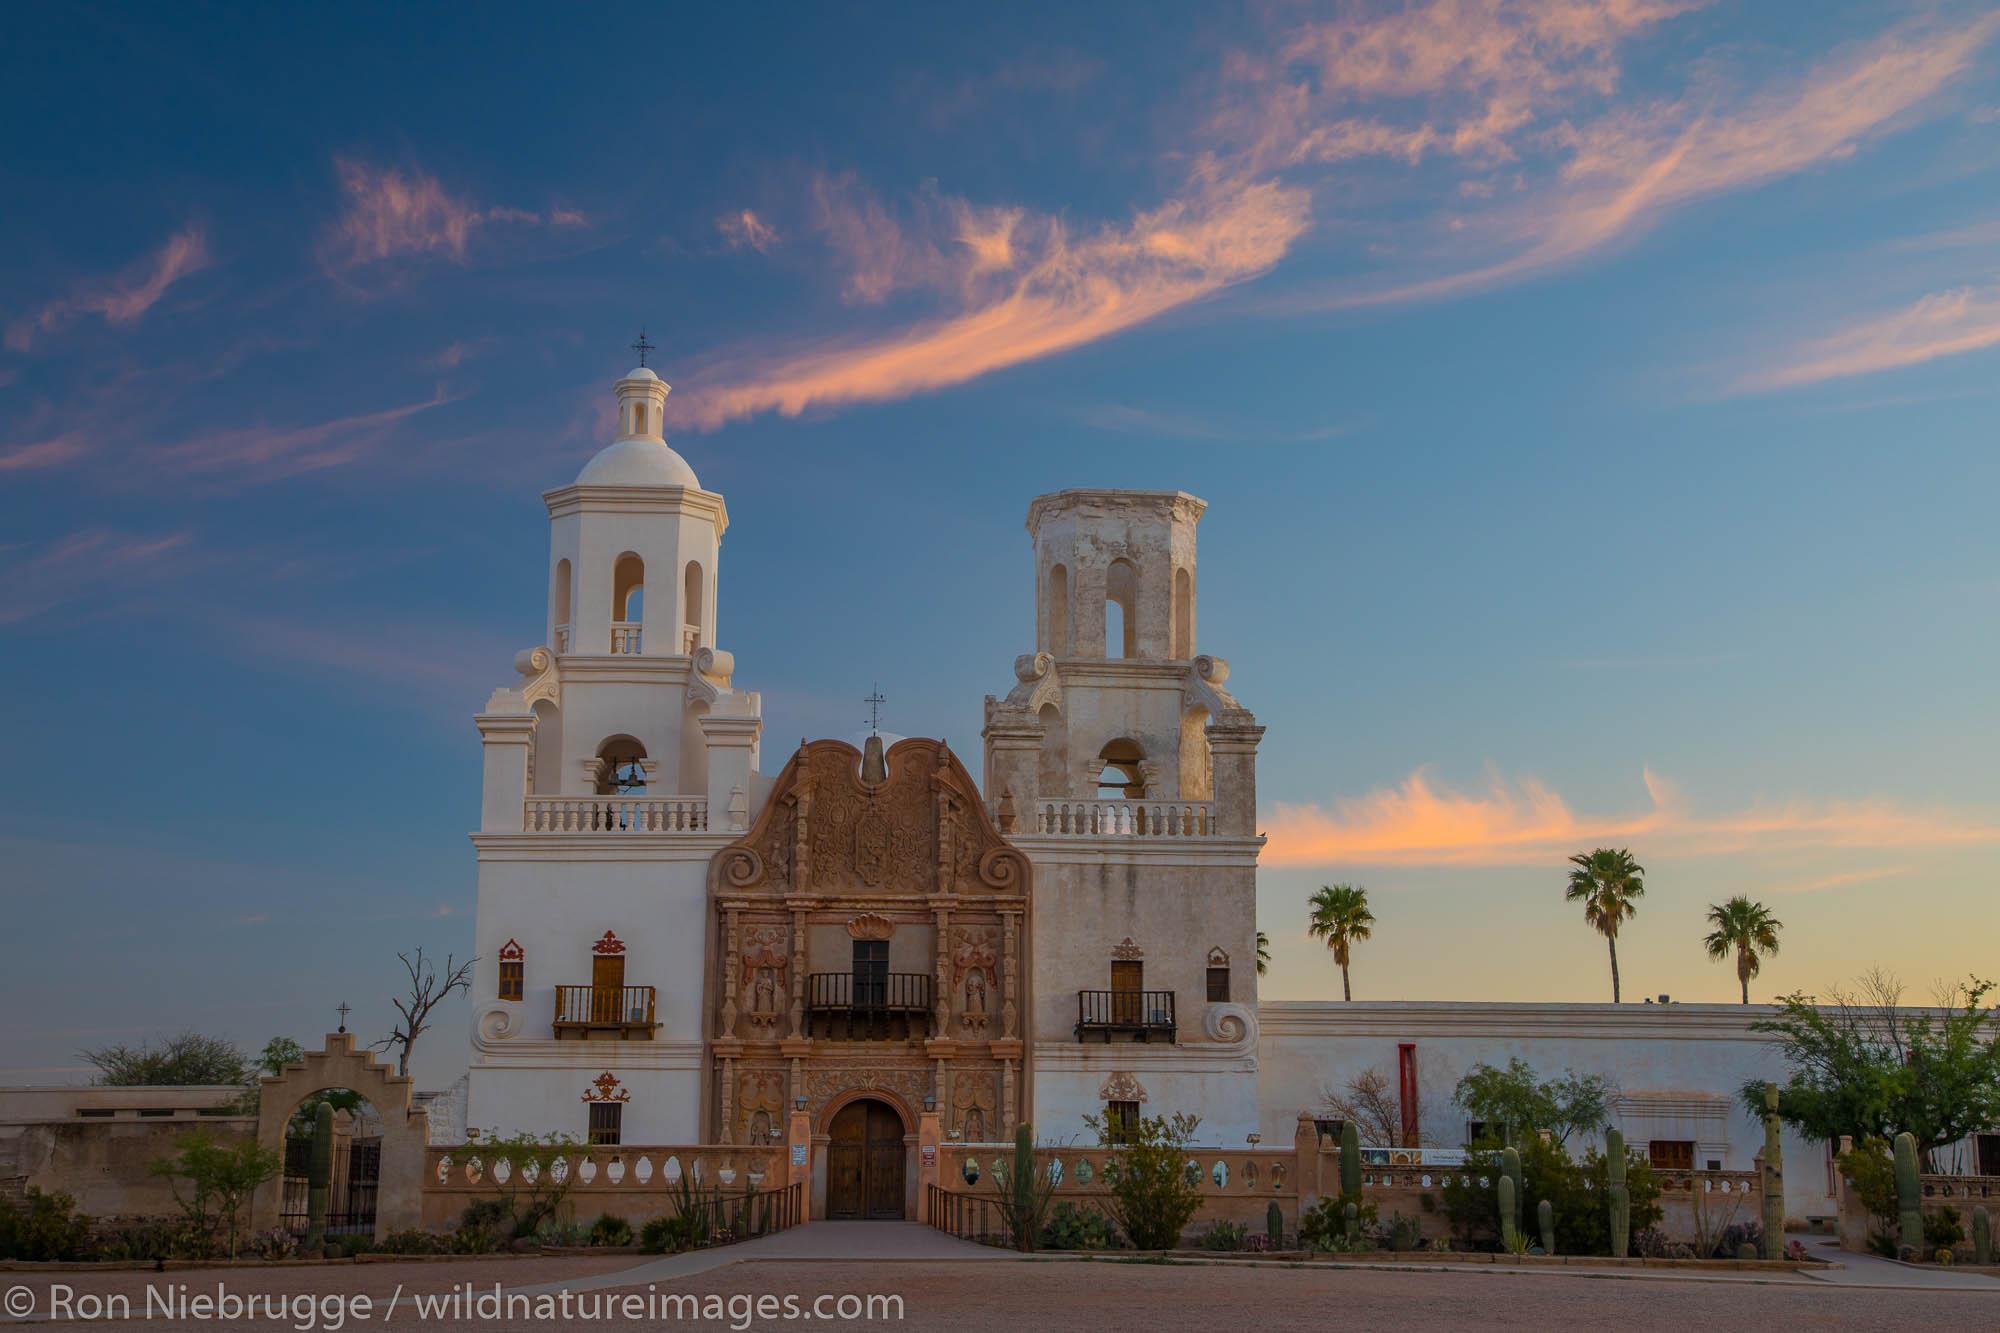 Mission San Xavier del Bac, Tucson, Arizona.